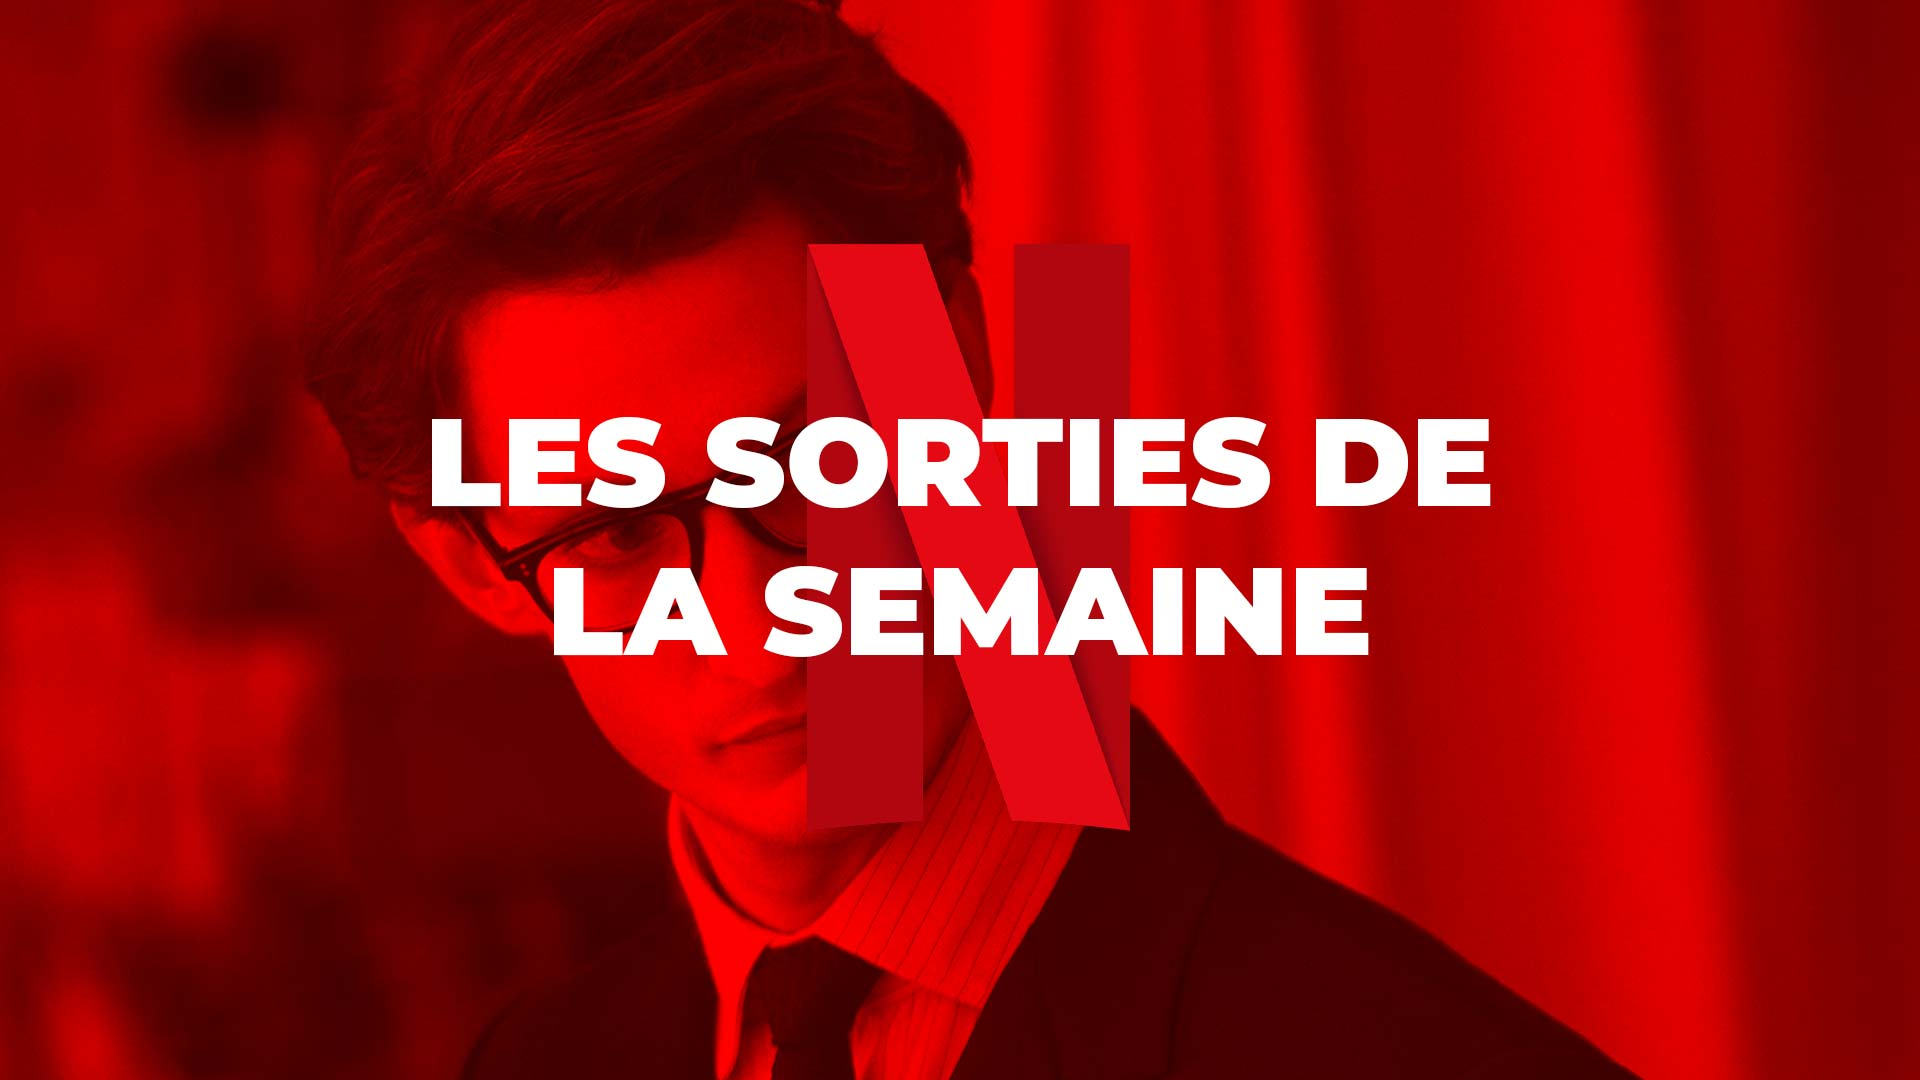 Yves Saint Laurent Netflix cover